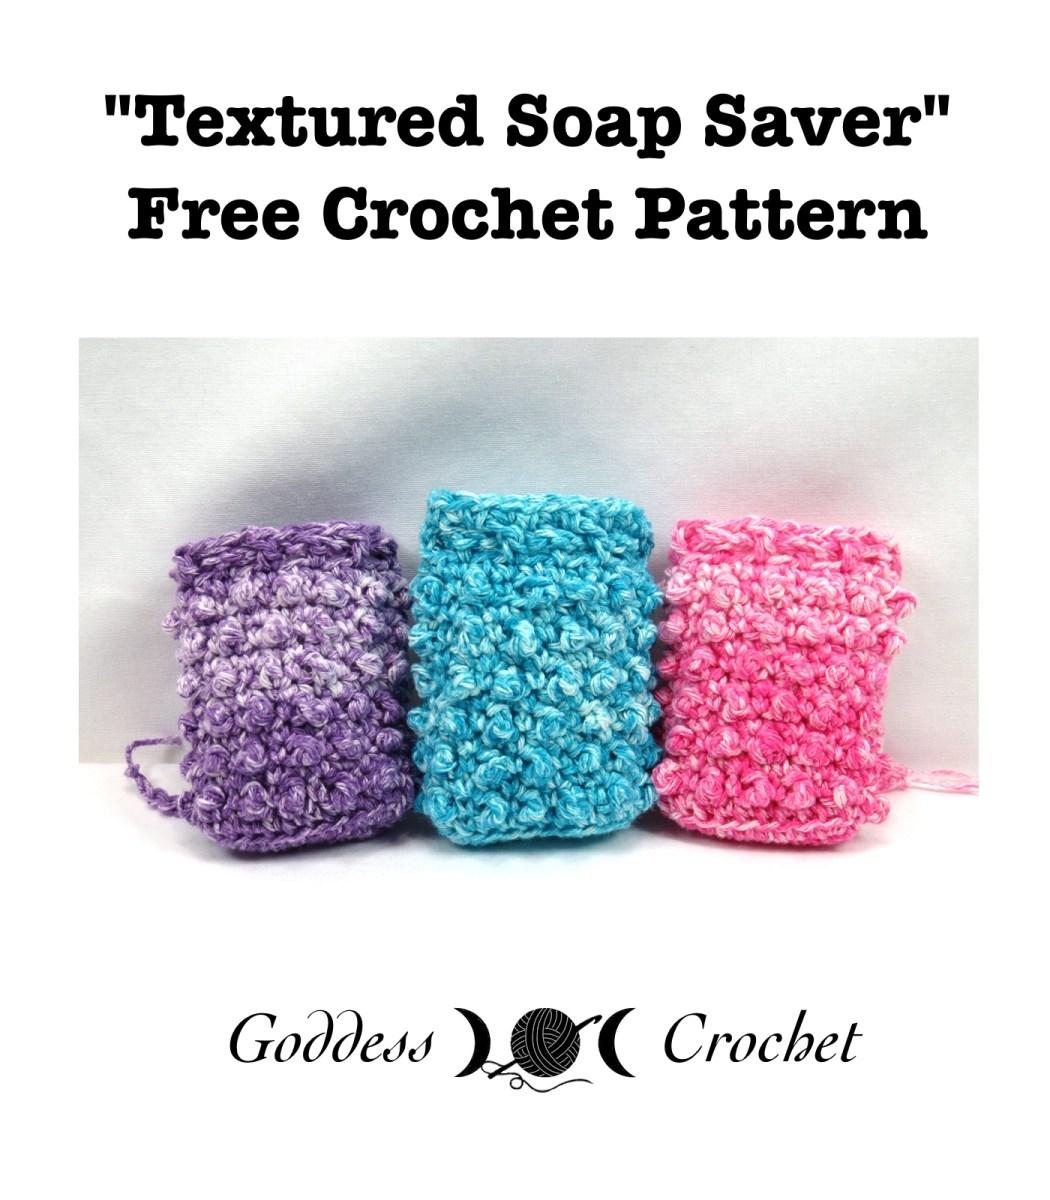 Textured Soap Saver - Free Crochet Pattern - Goddess Crochet